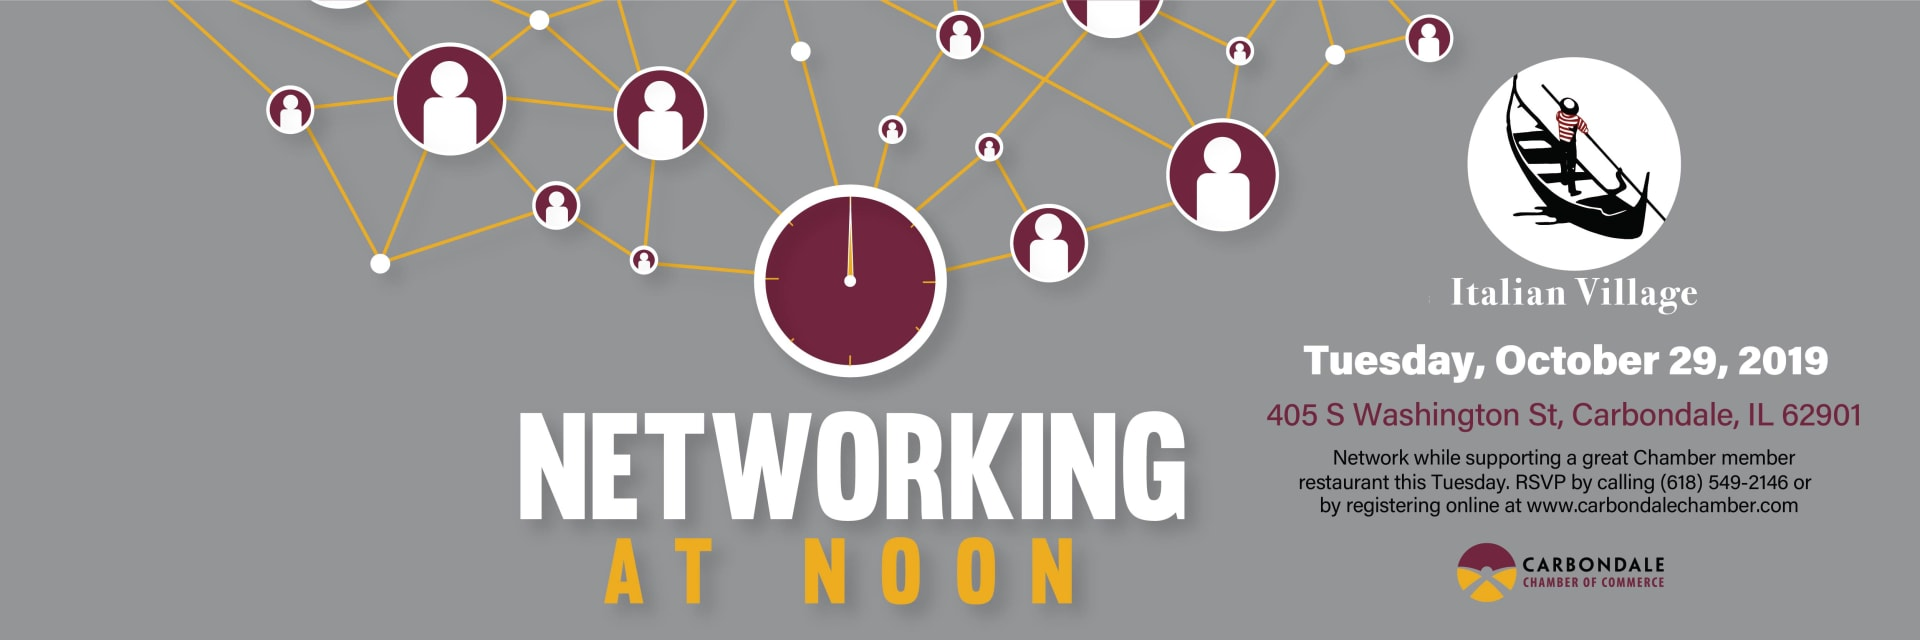 Networking-at-Noon_Oct-Slider-01-w1920.jpg